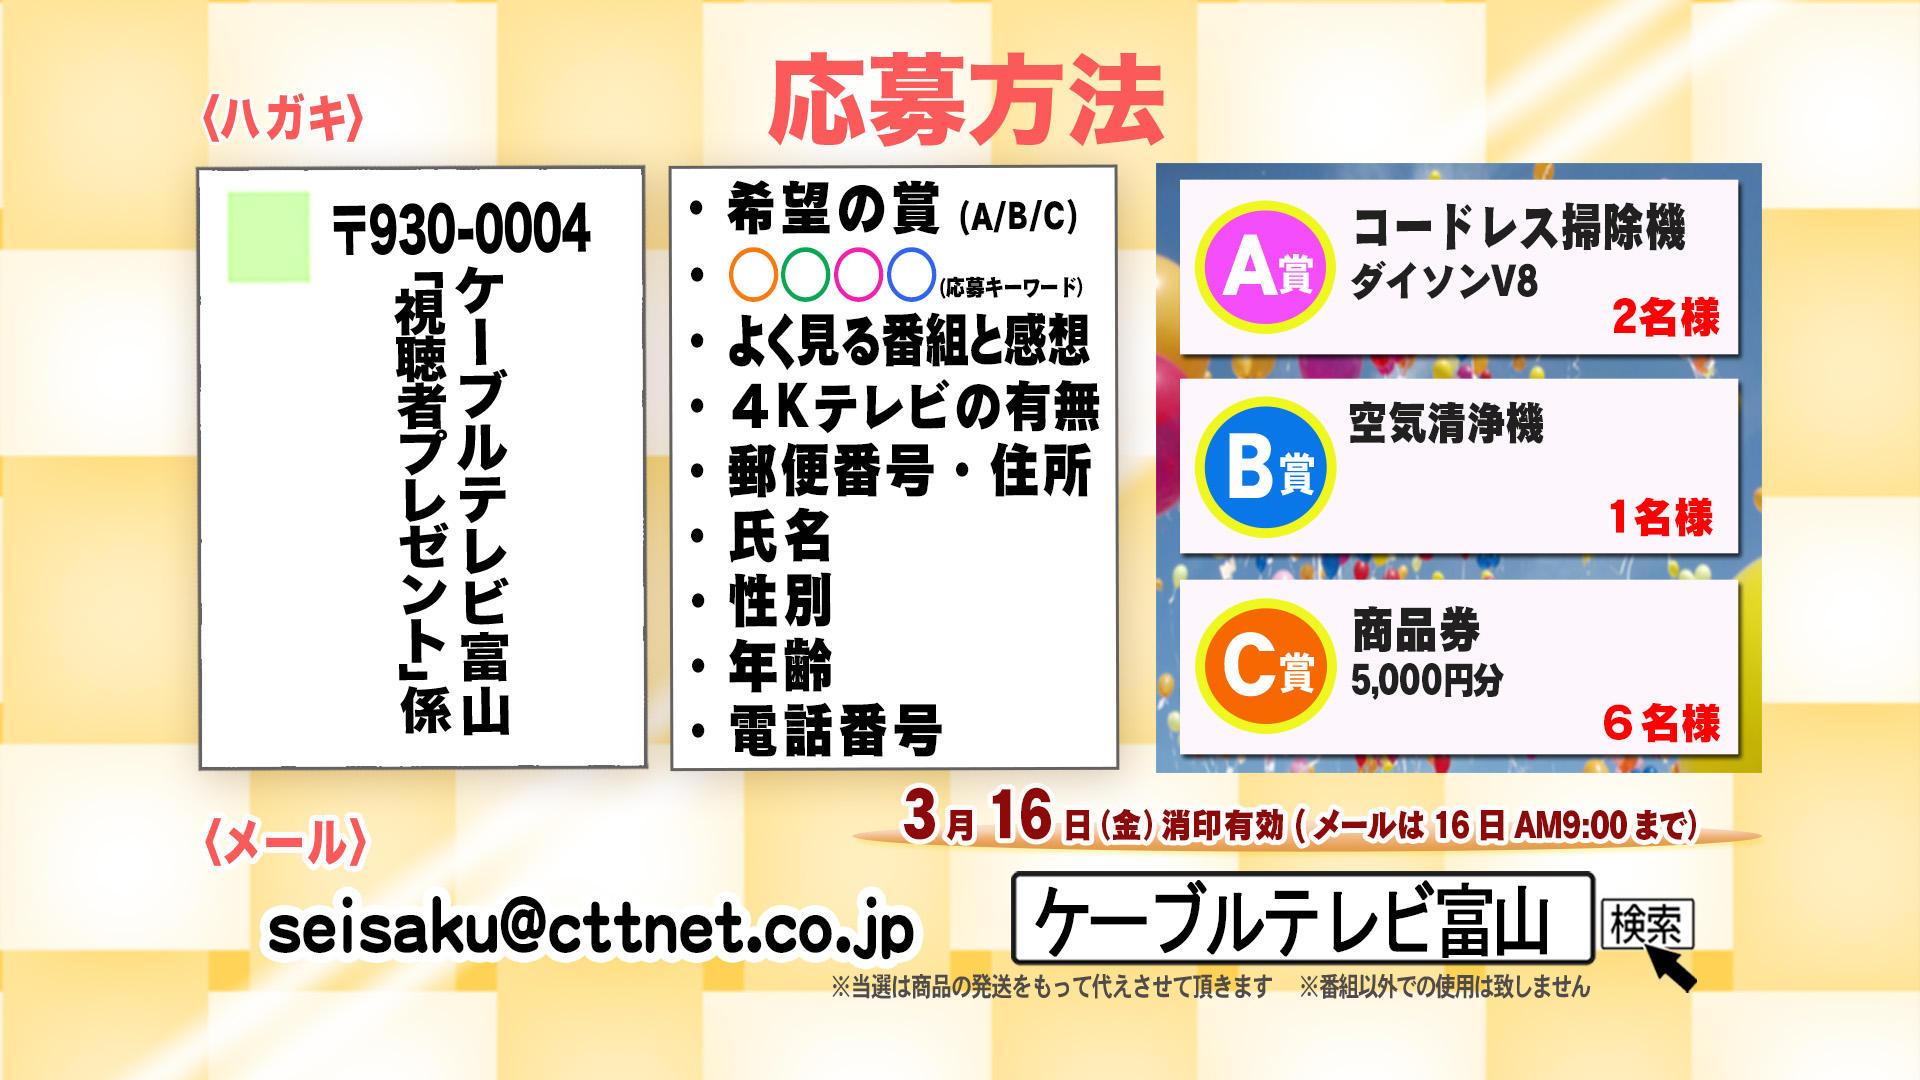 http://ctt.ne.jp/comichan/ecee53b61c366673c94084278ee1f83267d6f9ce.jpg